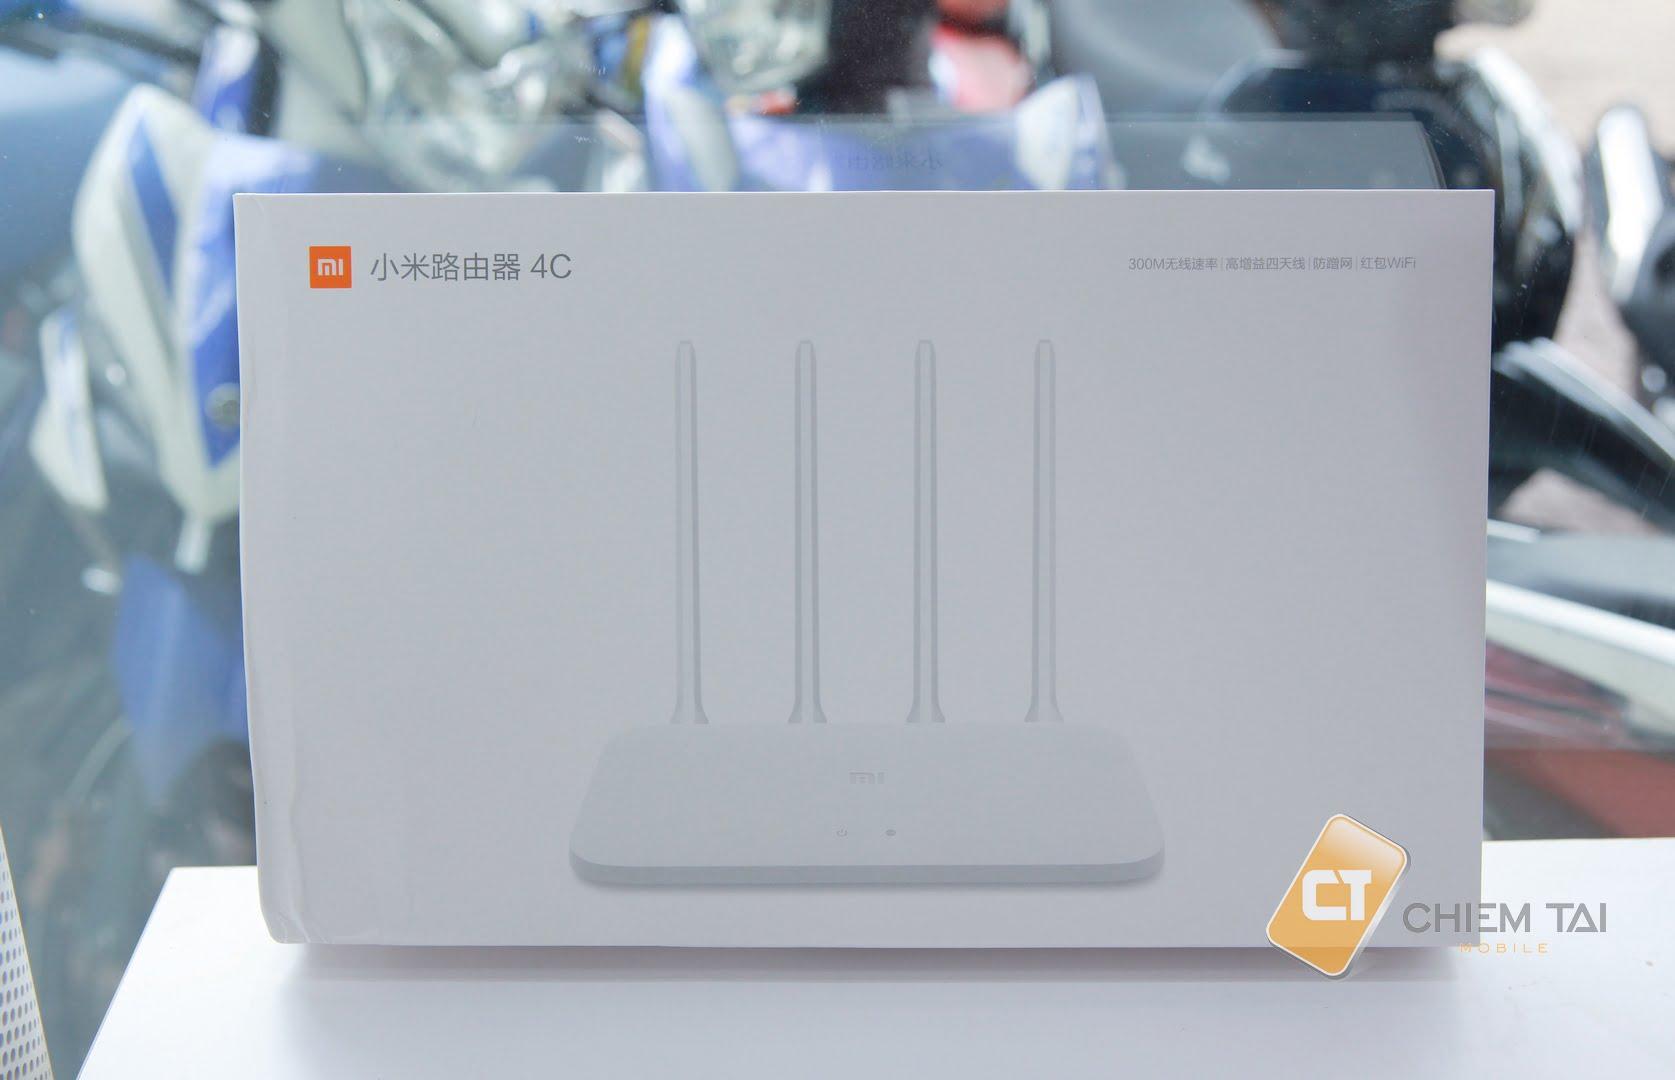 router wifi xiaomi gen 4c 6007fd820486e